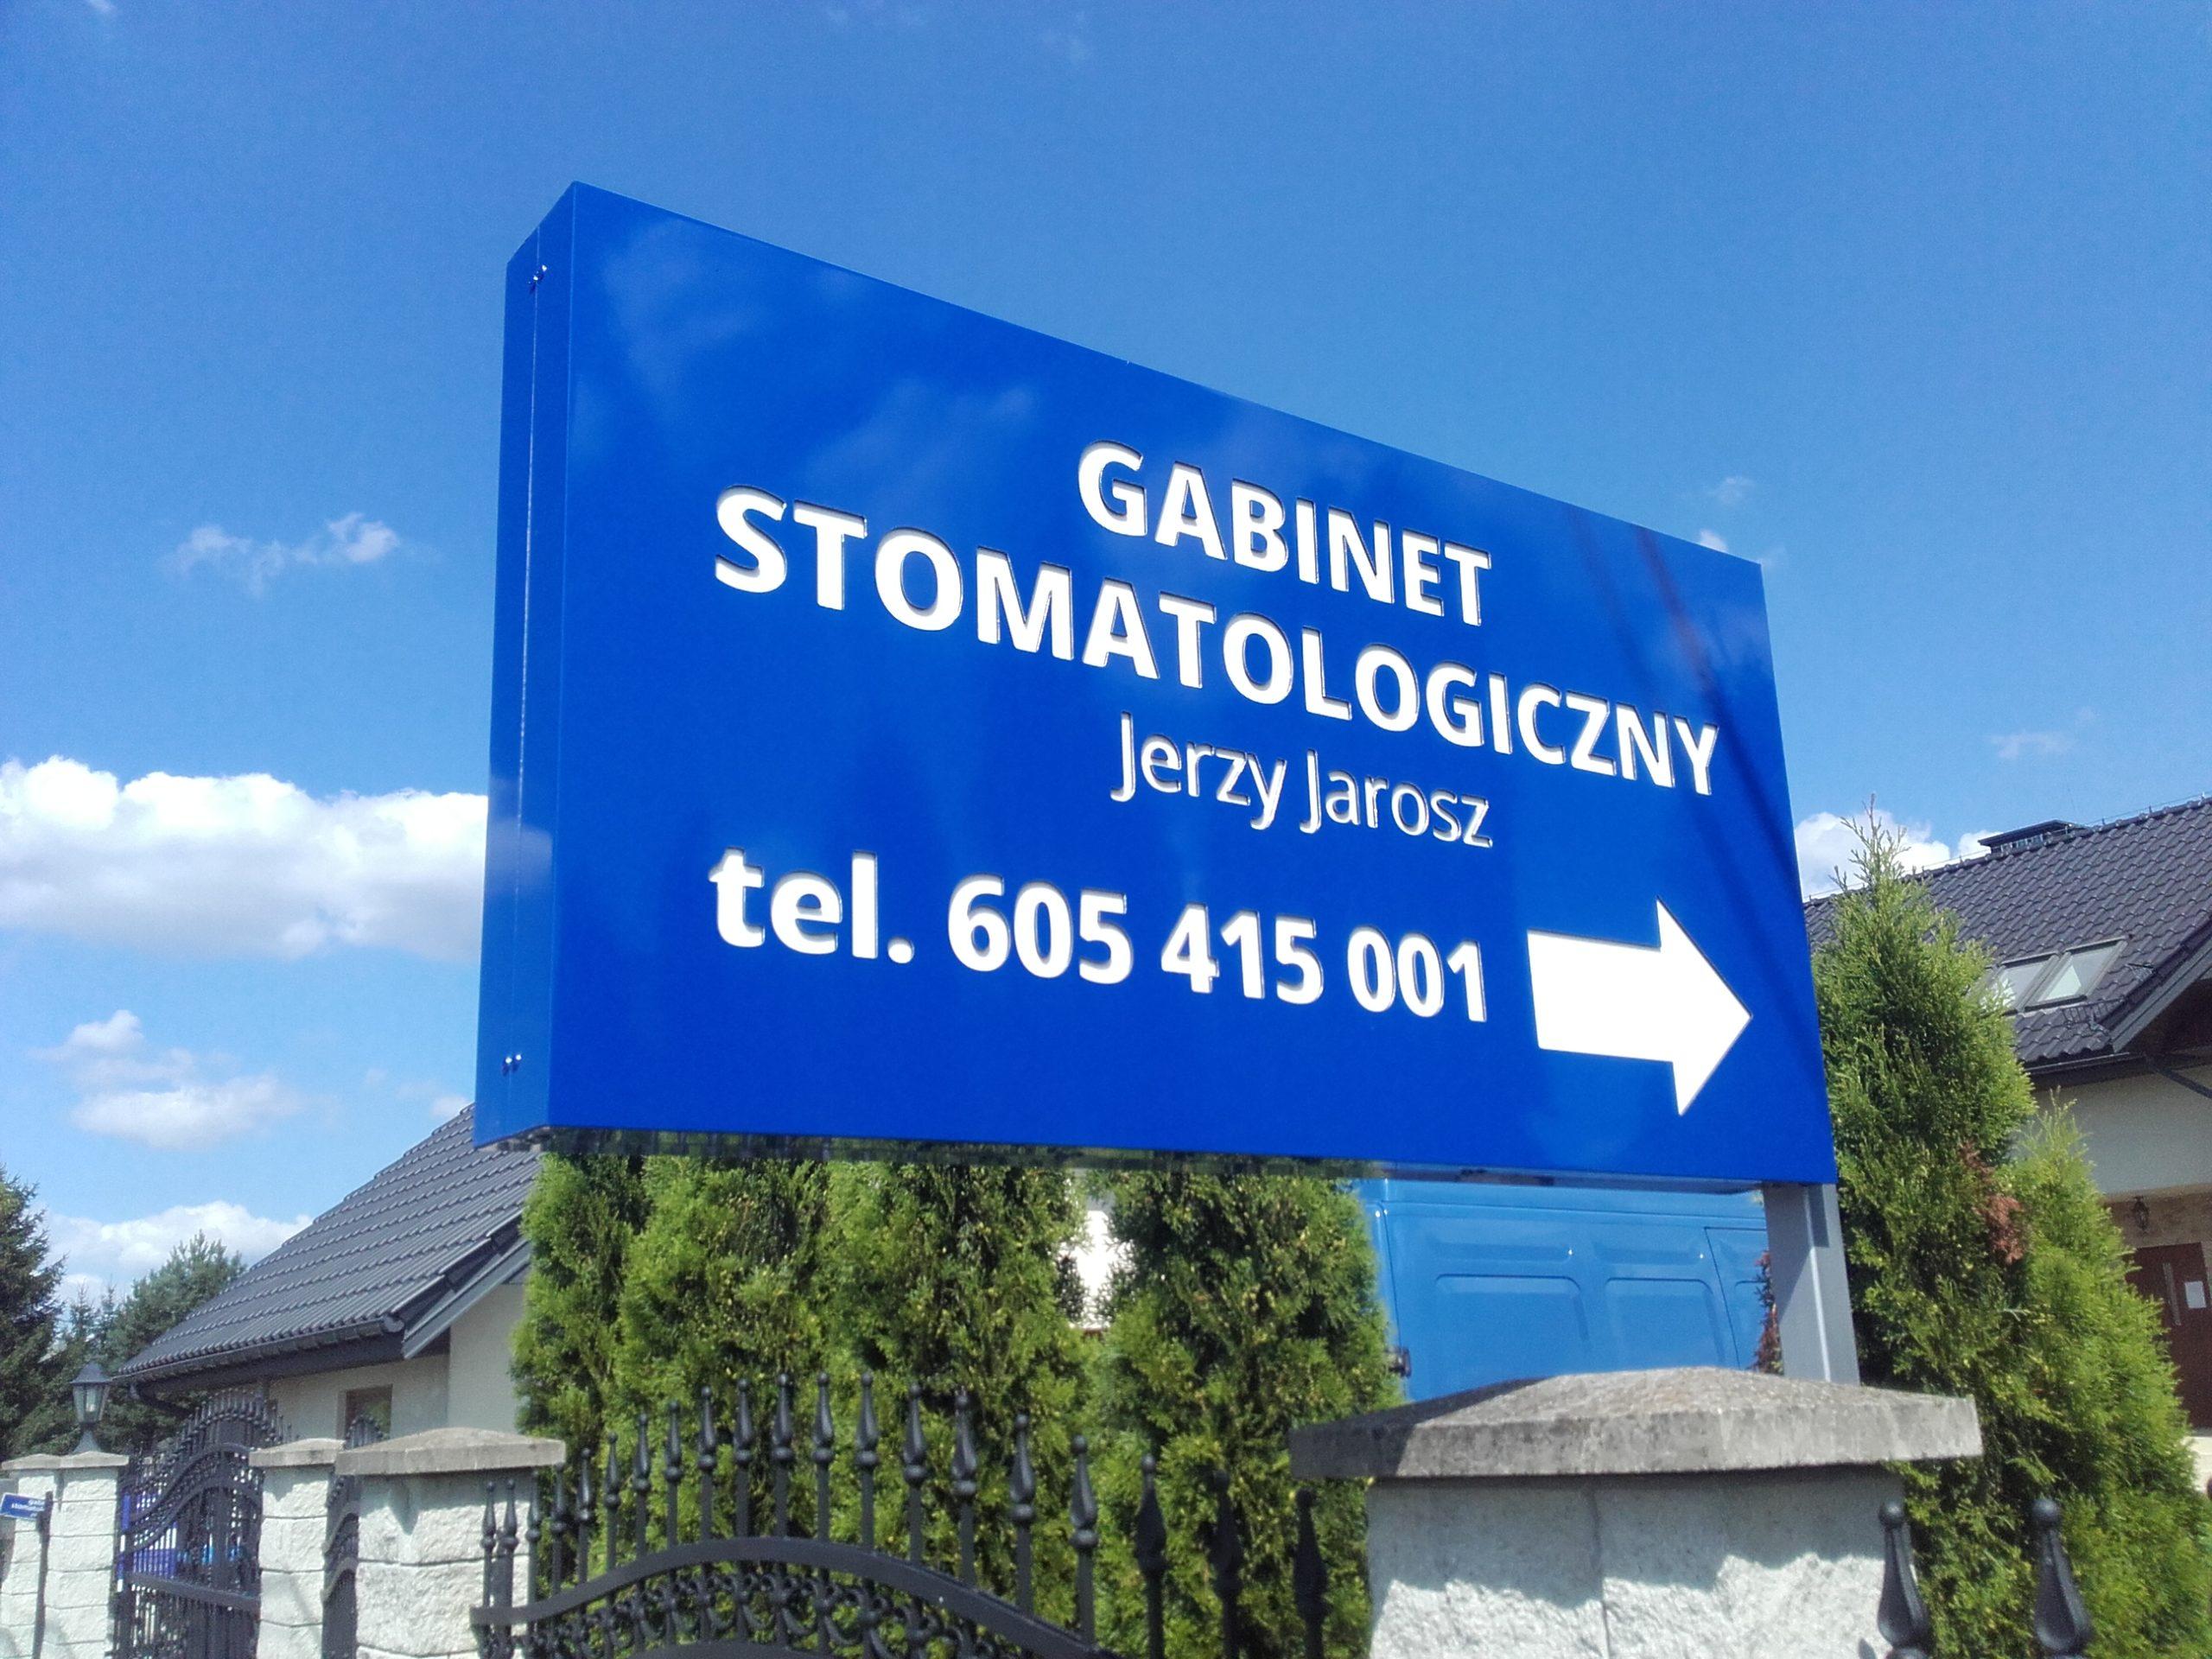 Realizacja reklamy Gabinet Stomatologiczny